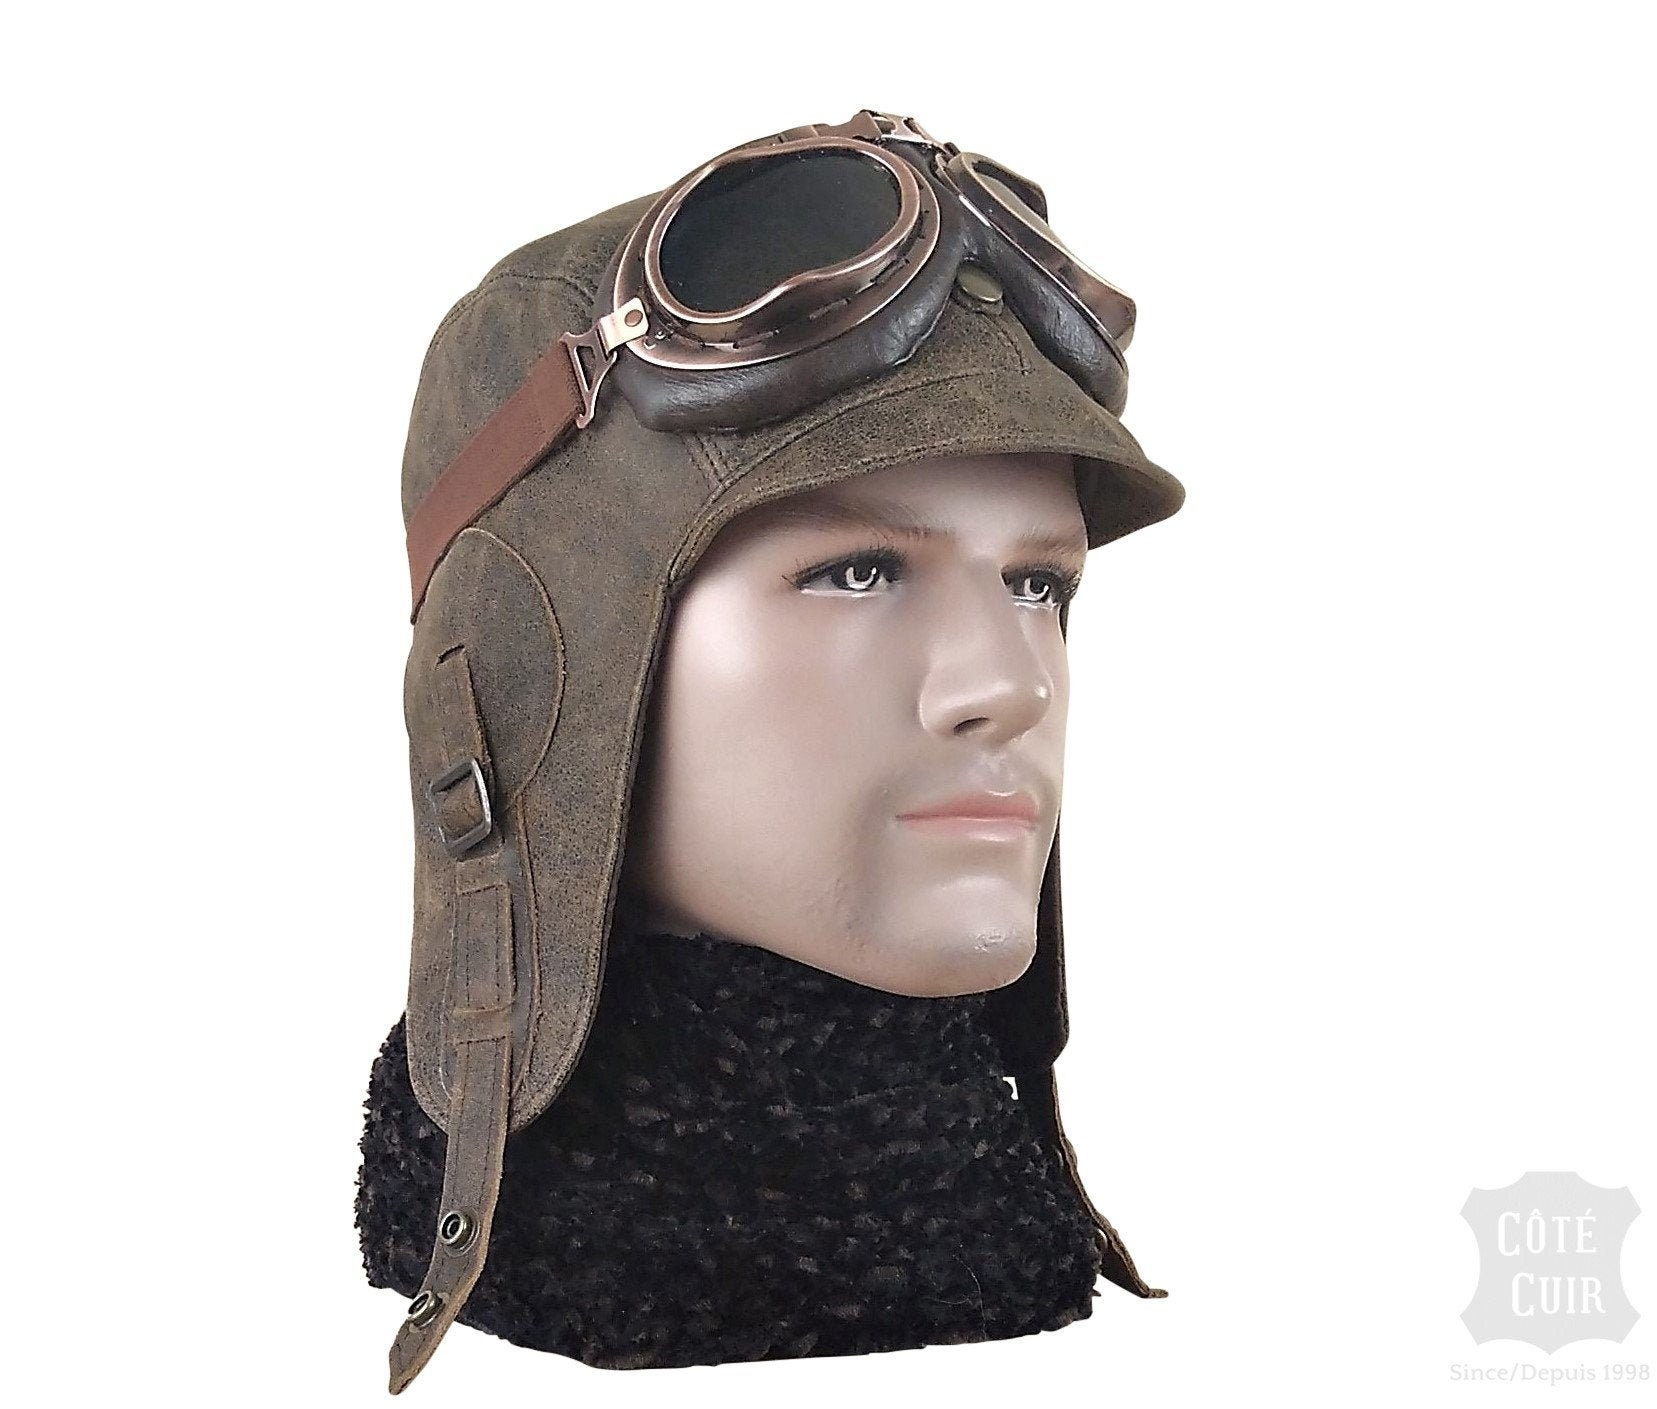 BIGGLES leather flying helmet Inc Lunettes WW2 Cuir Style Aviateur Bonnet aviateur.